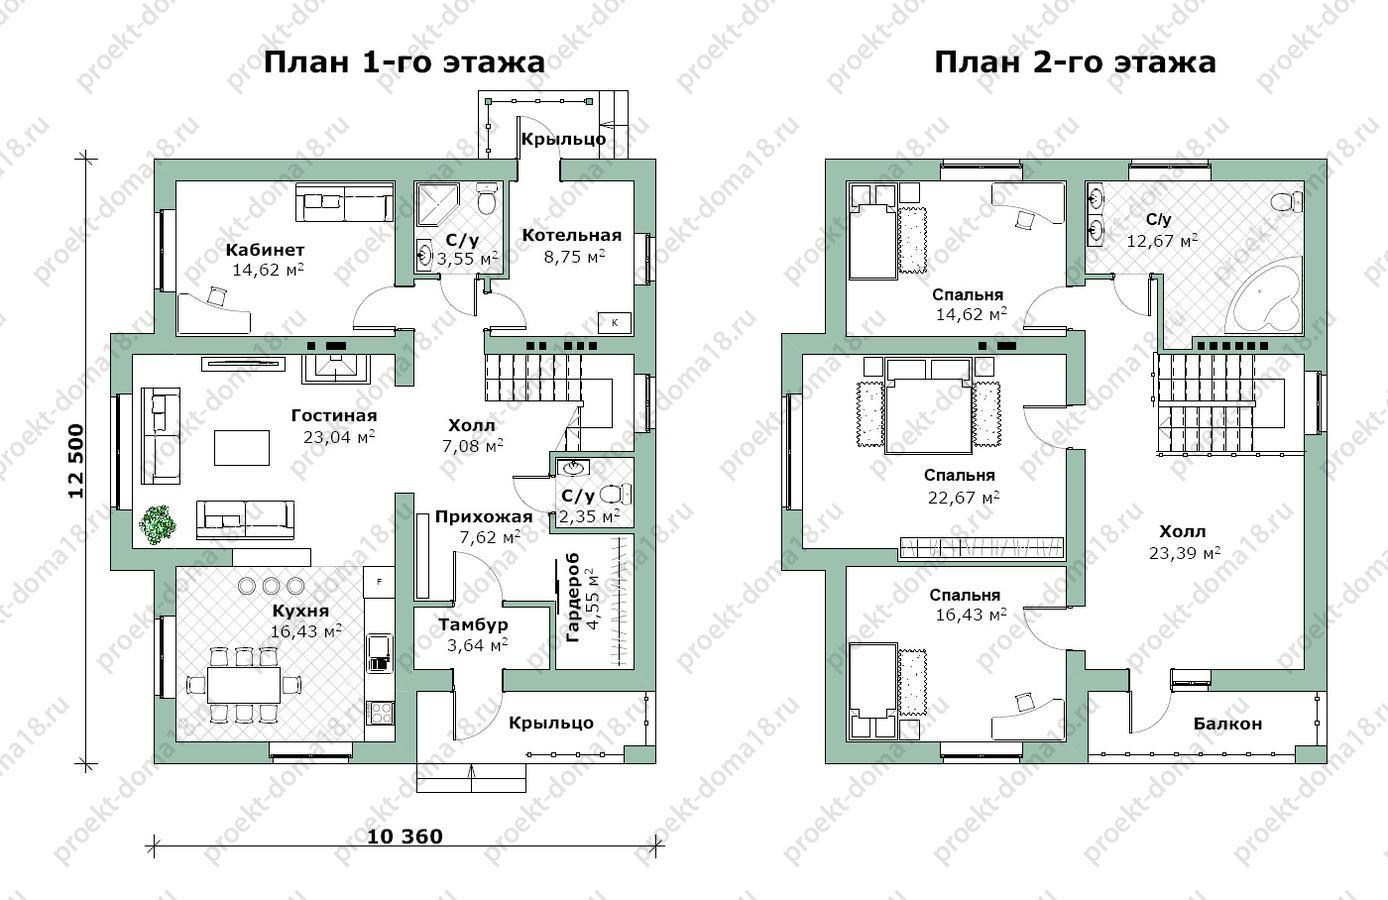 Проект Н-09-15 план